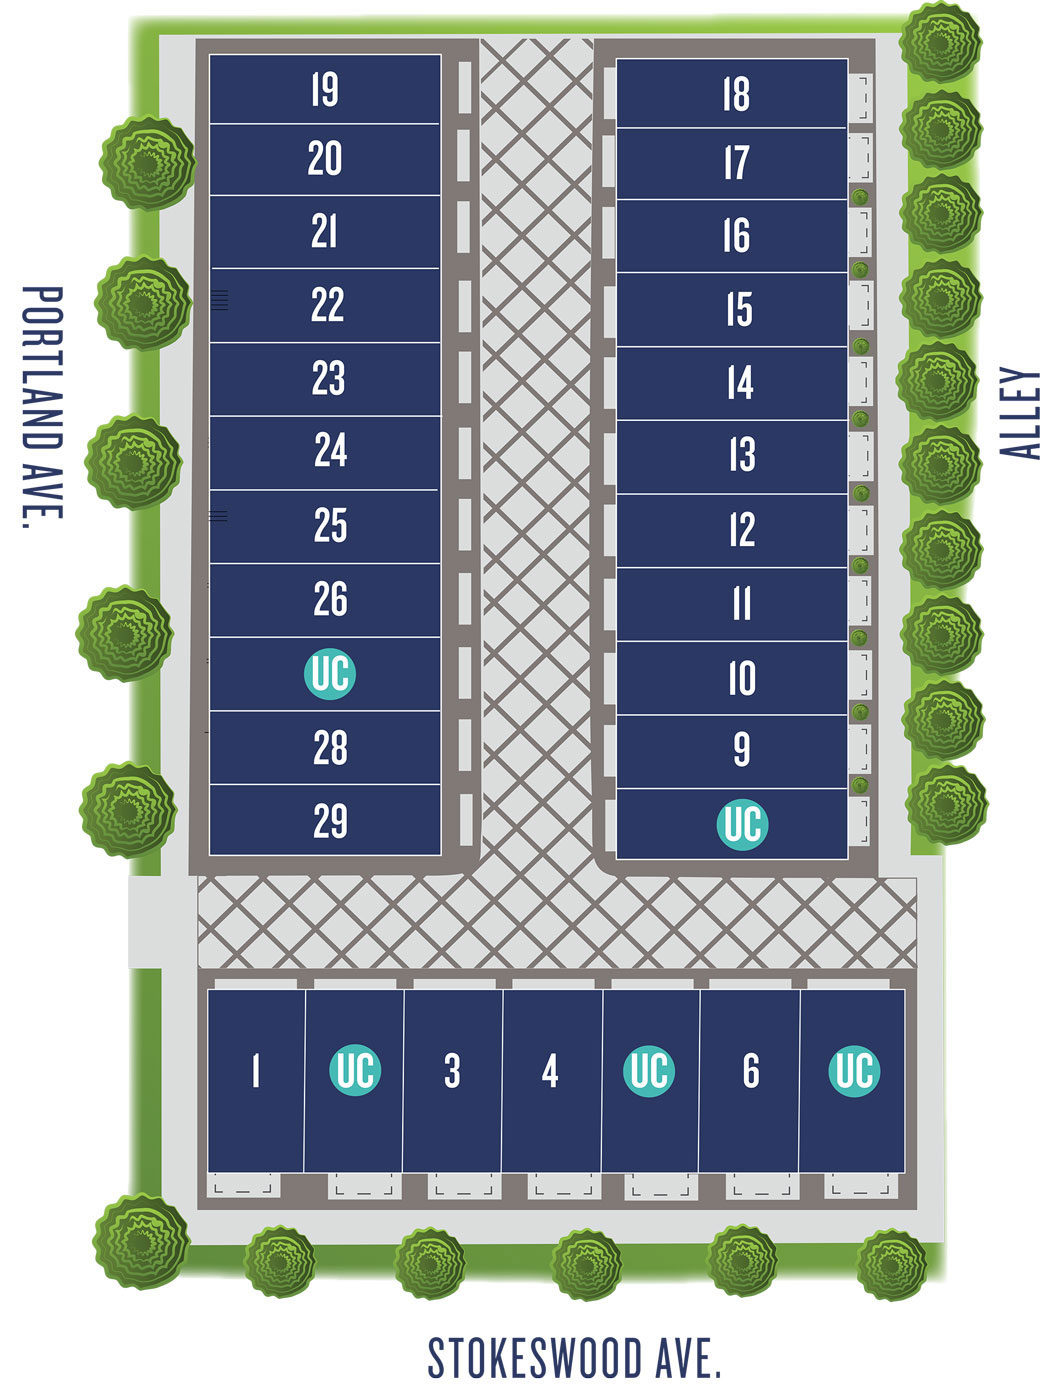 Portland Row Site plan